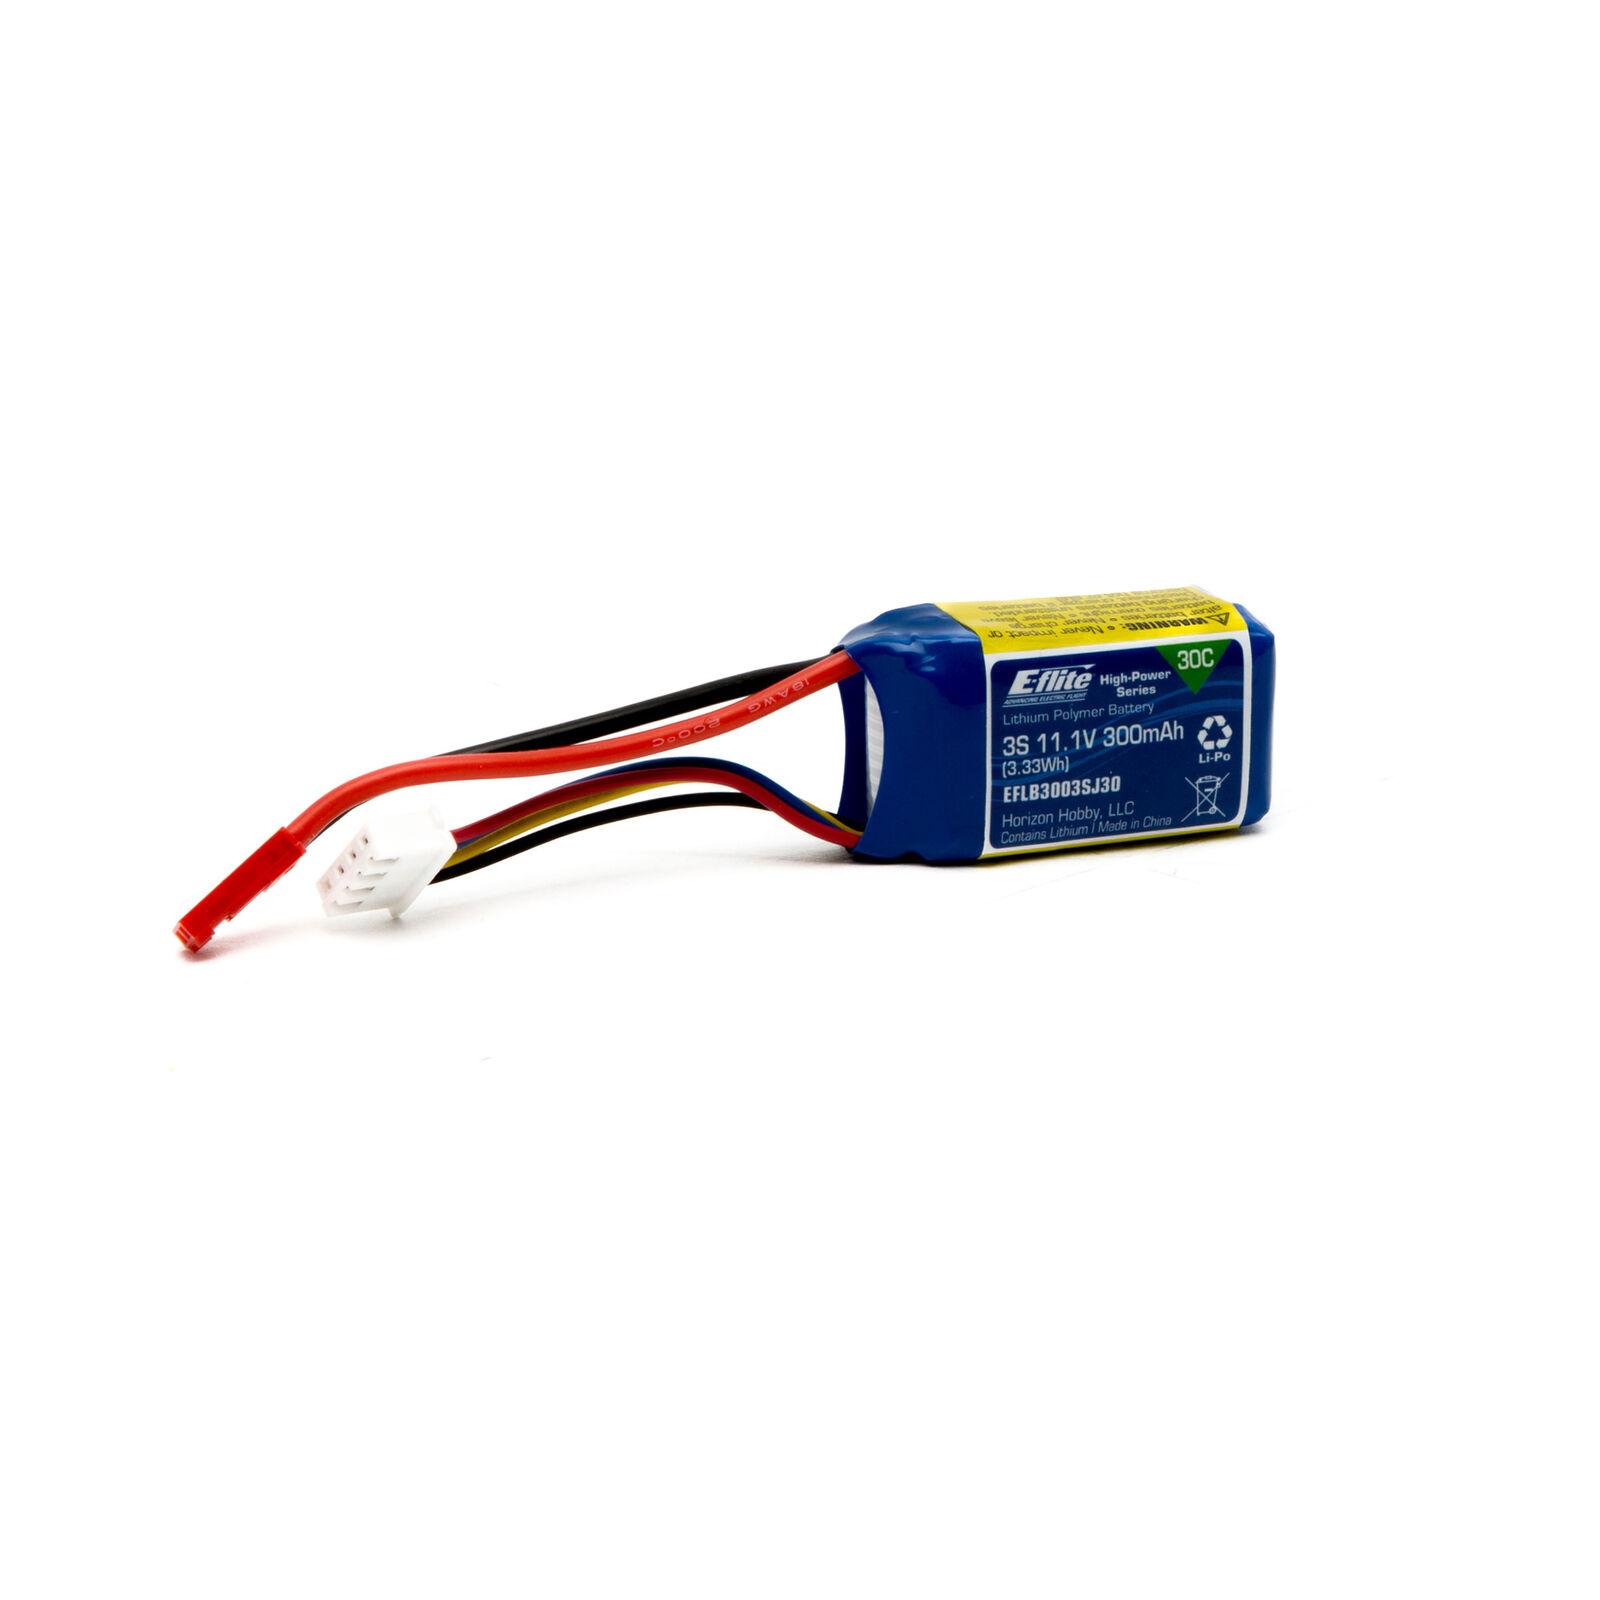 11.1V 300mAh 3S 30C LiPo Battery: JST